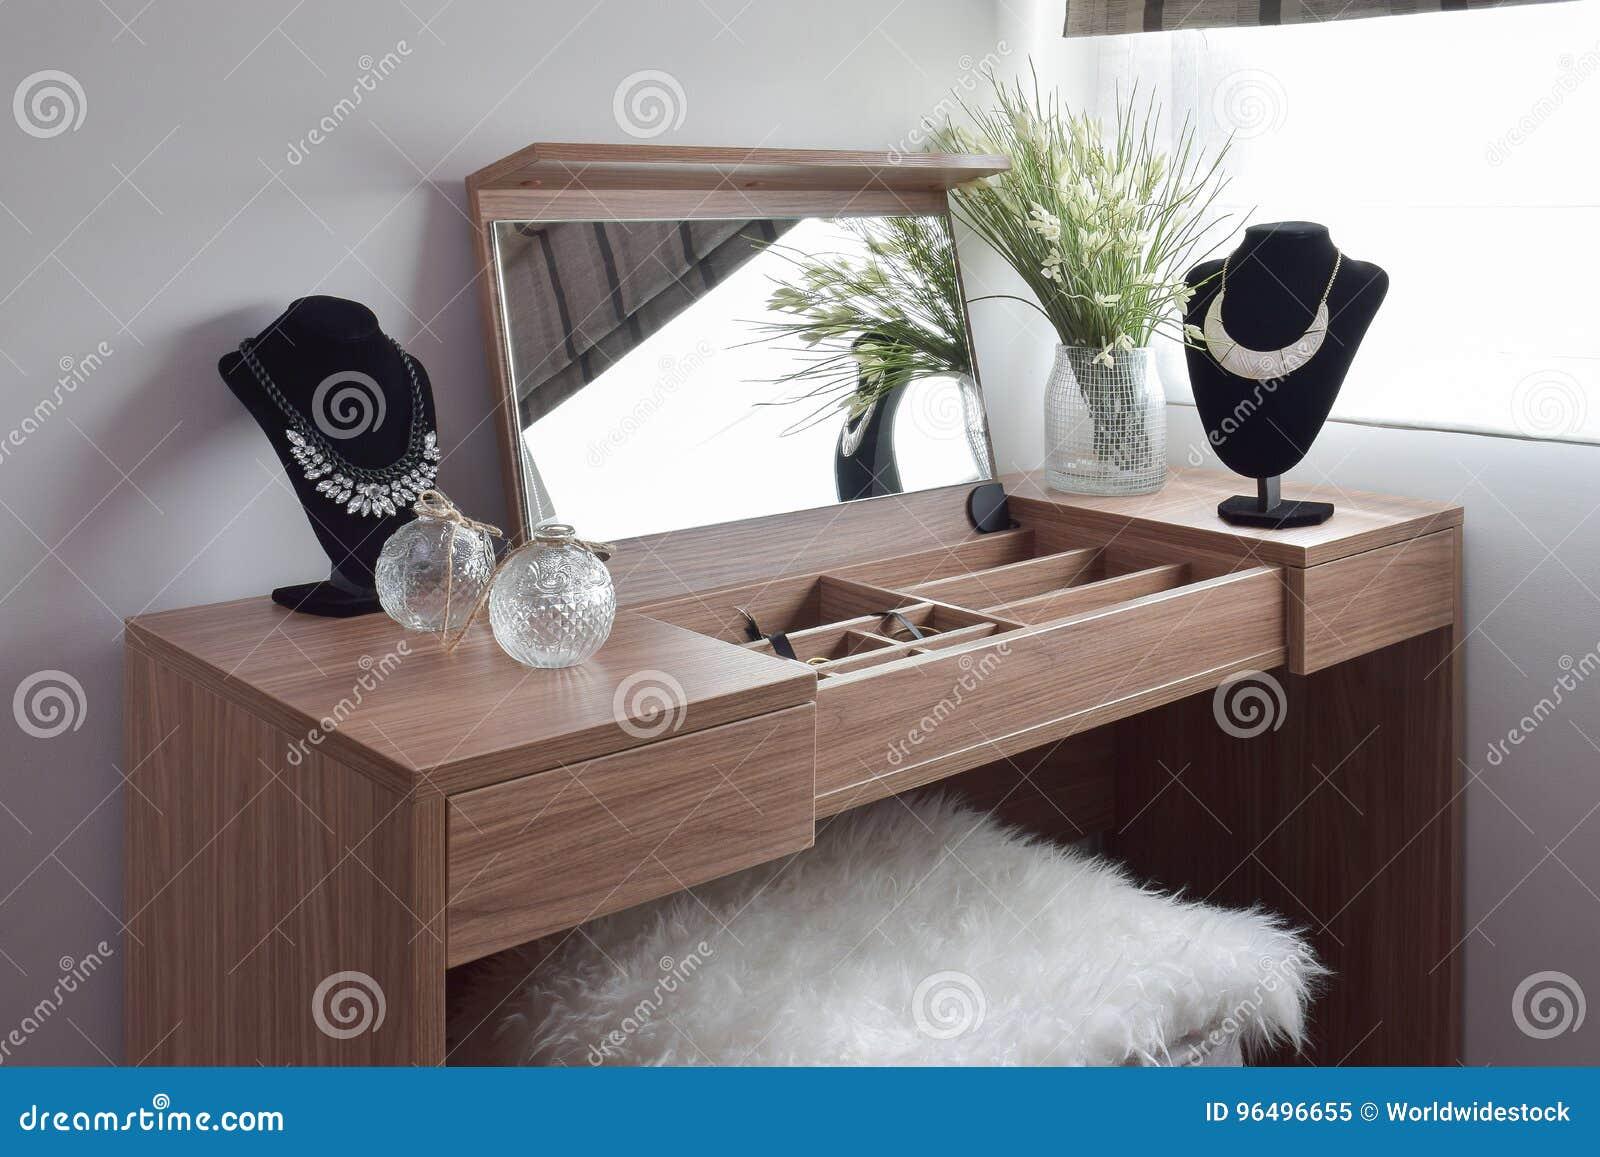 Mooie Halsbanden Op Houten Toilettafel En Thite Wollen Kruk Stock Afbeelding ...